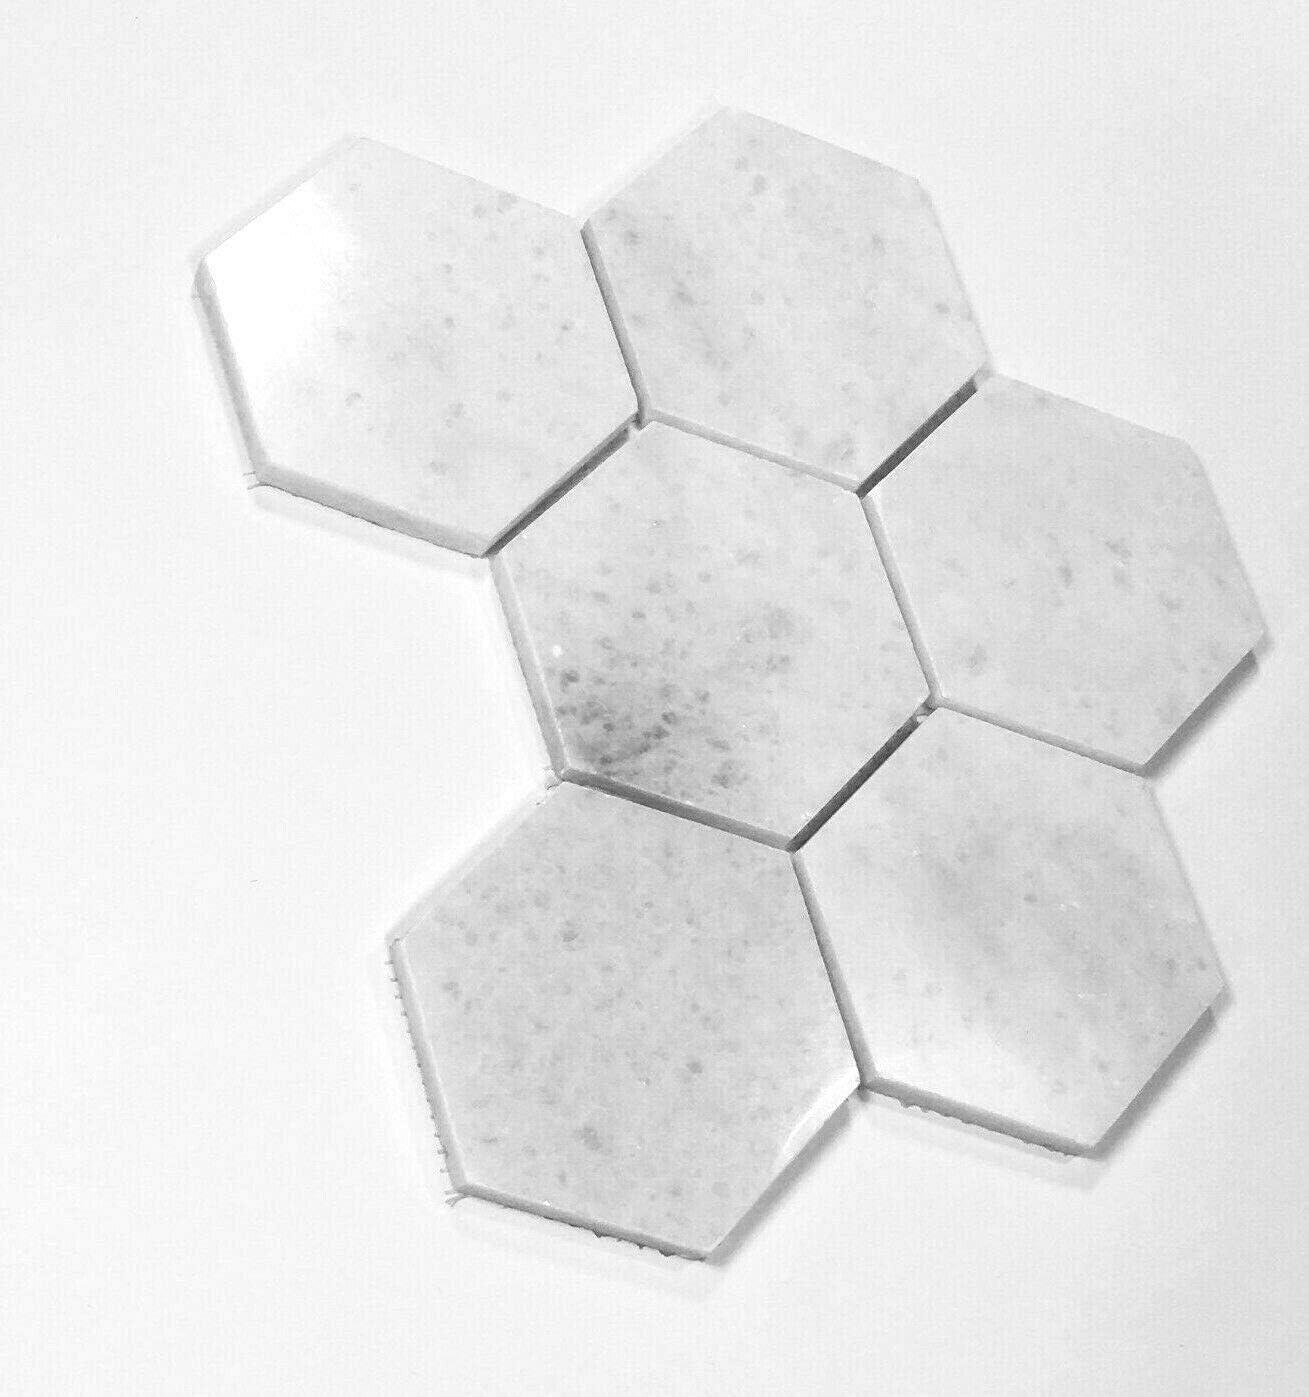 Carrara White 4 Hexagon Marble Mosaic Wall Floor Tile Backsplash Bath Kitchen